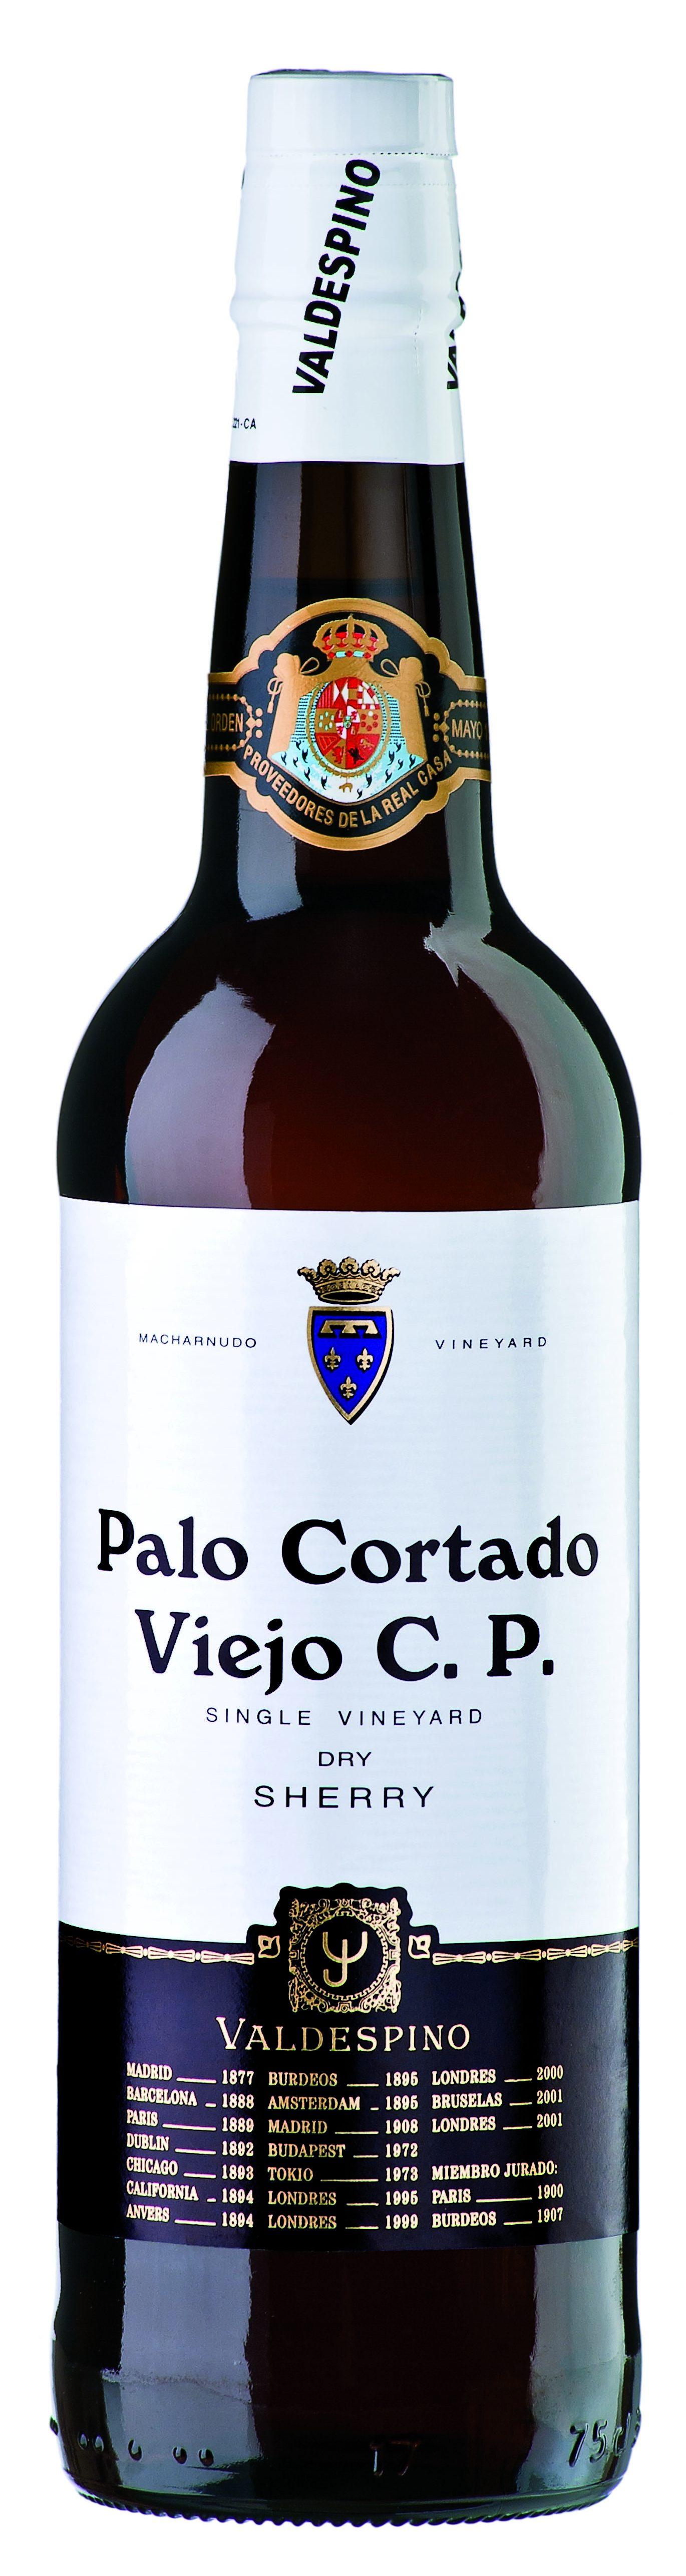 Valdespino Palo Cortado Viejo C.P. Dry Sherry